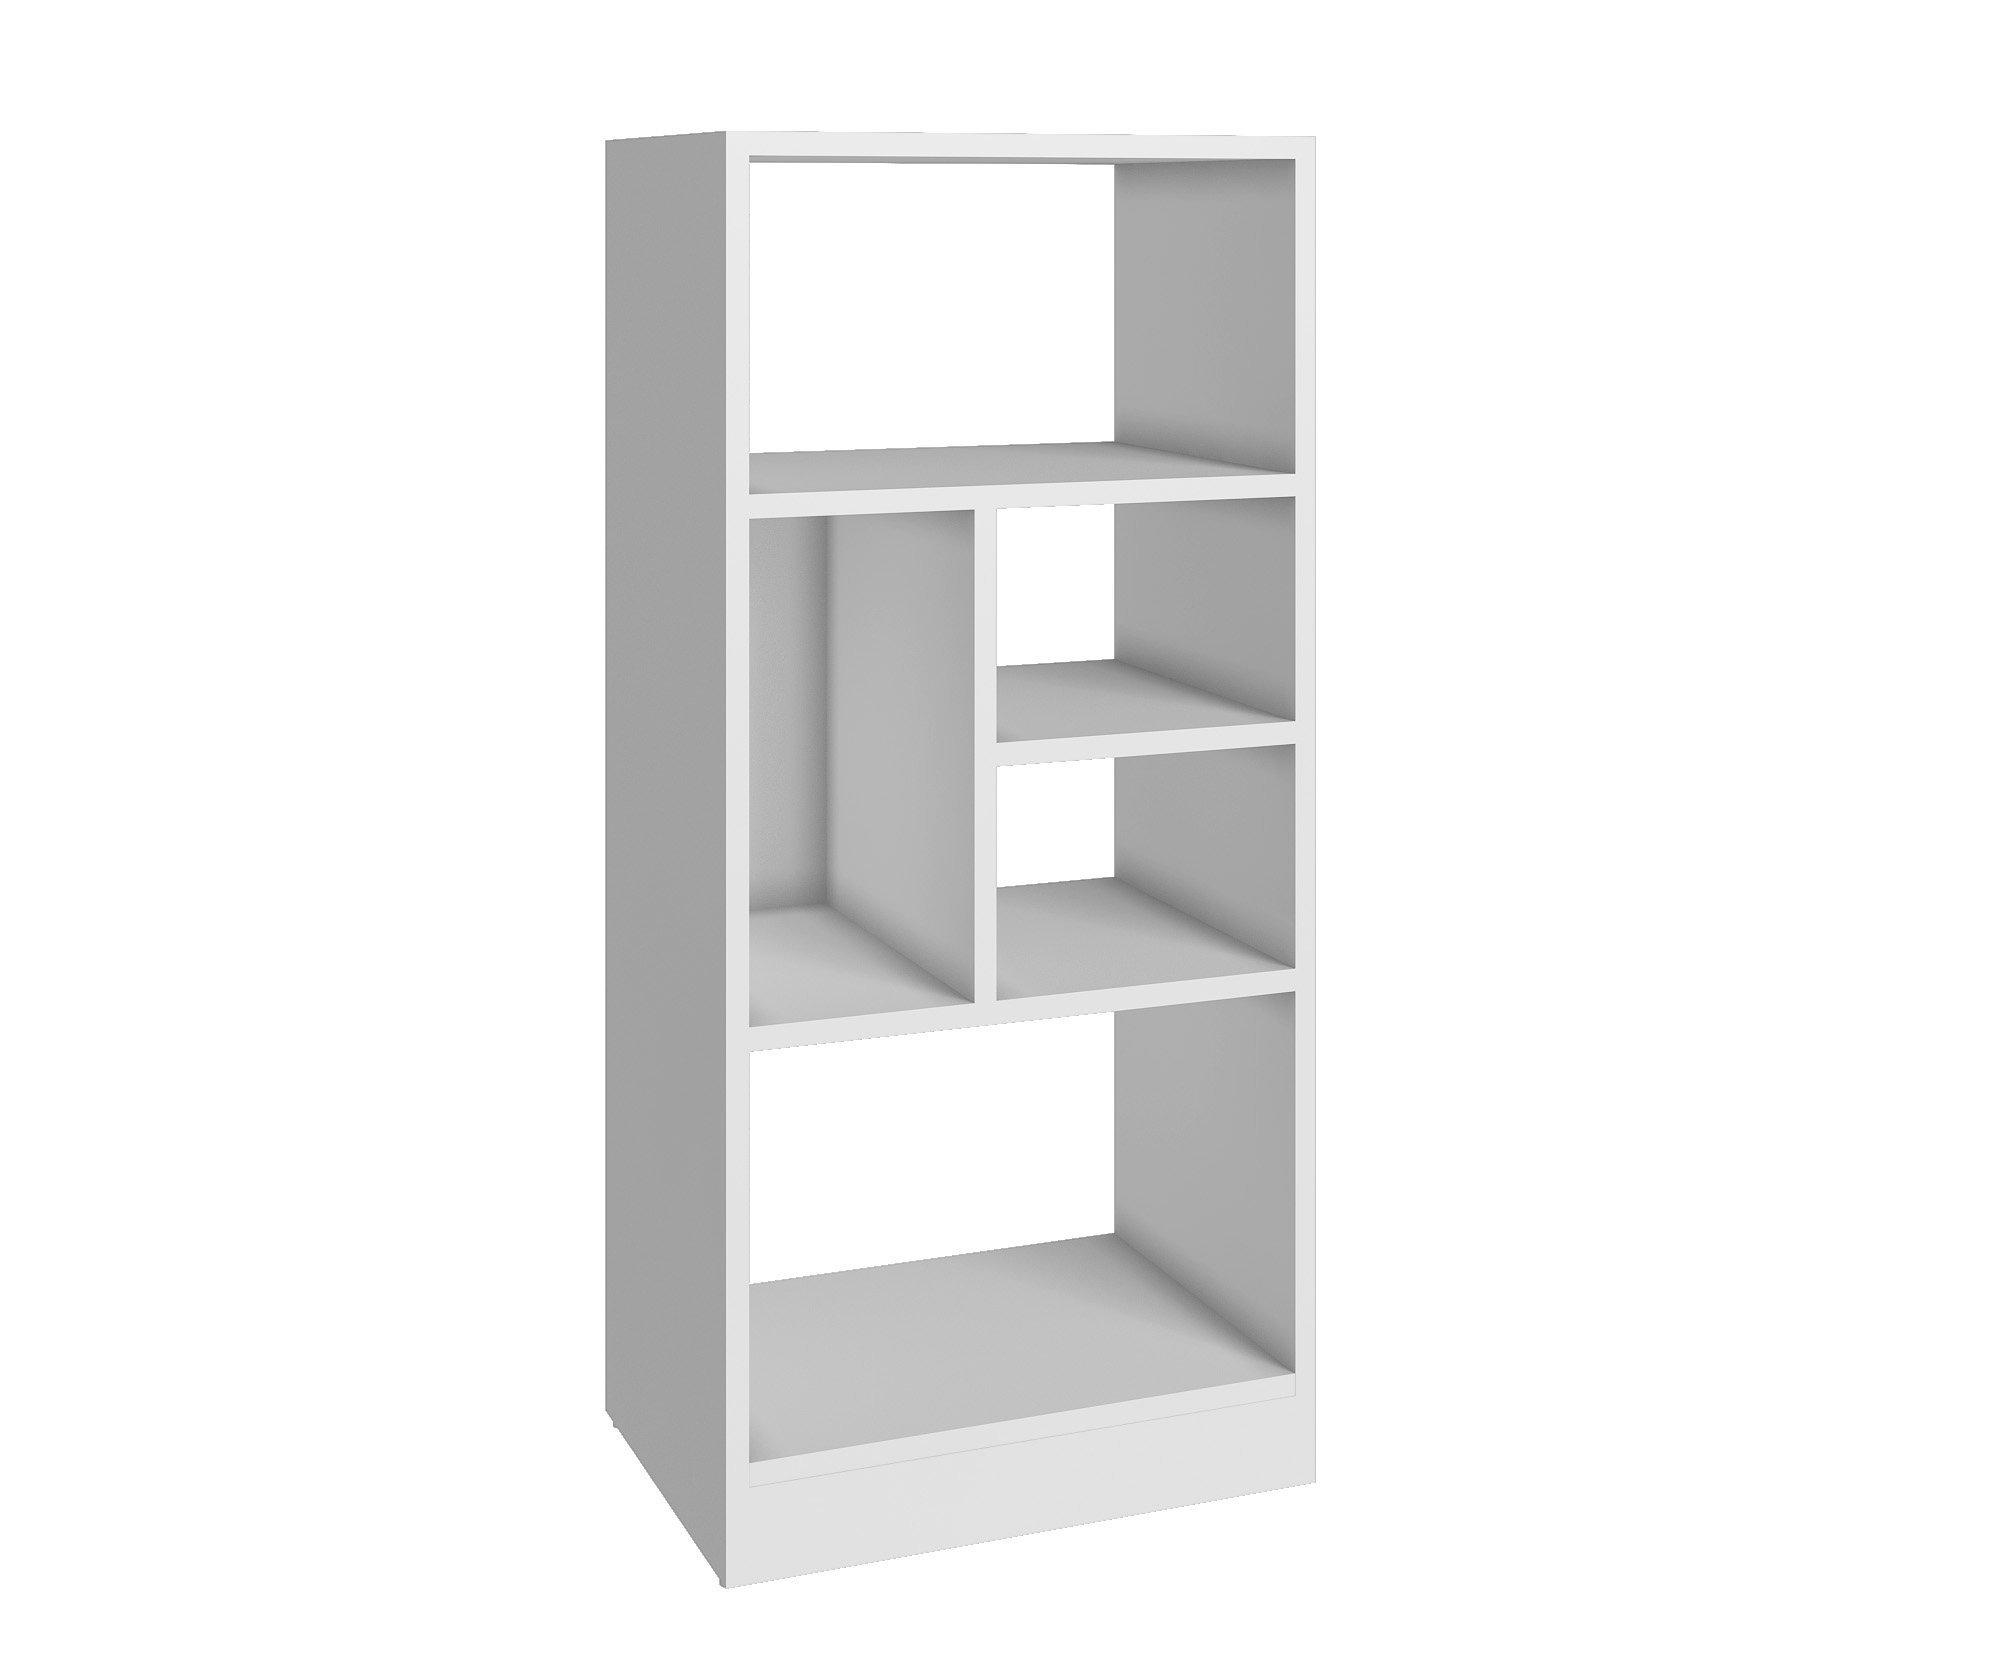 Manhattan Comfort Valenca 2.0 Collection Modern Decorative Free Standing 5 Shelf Bookcase with Open Shelf Design, White